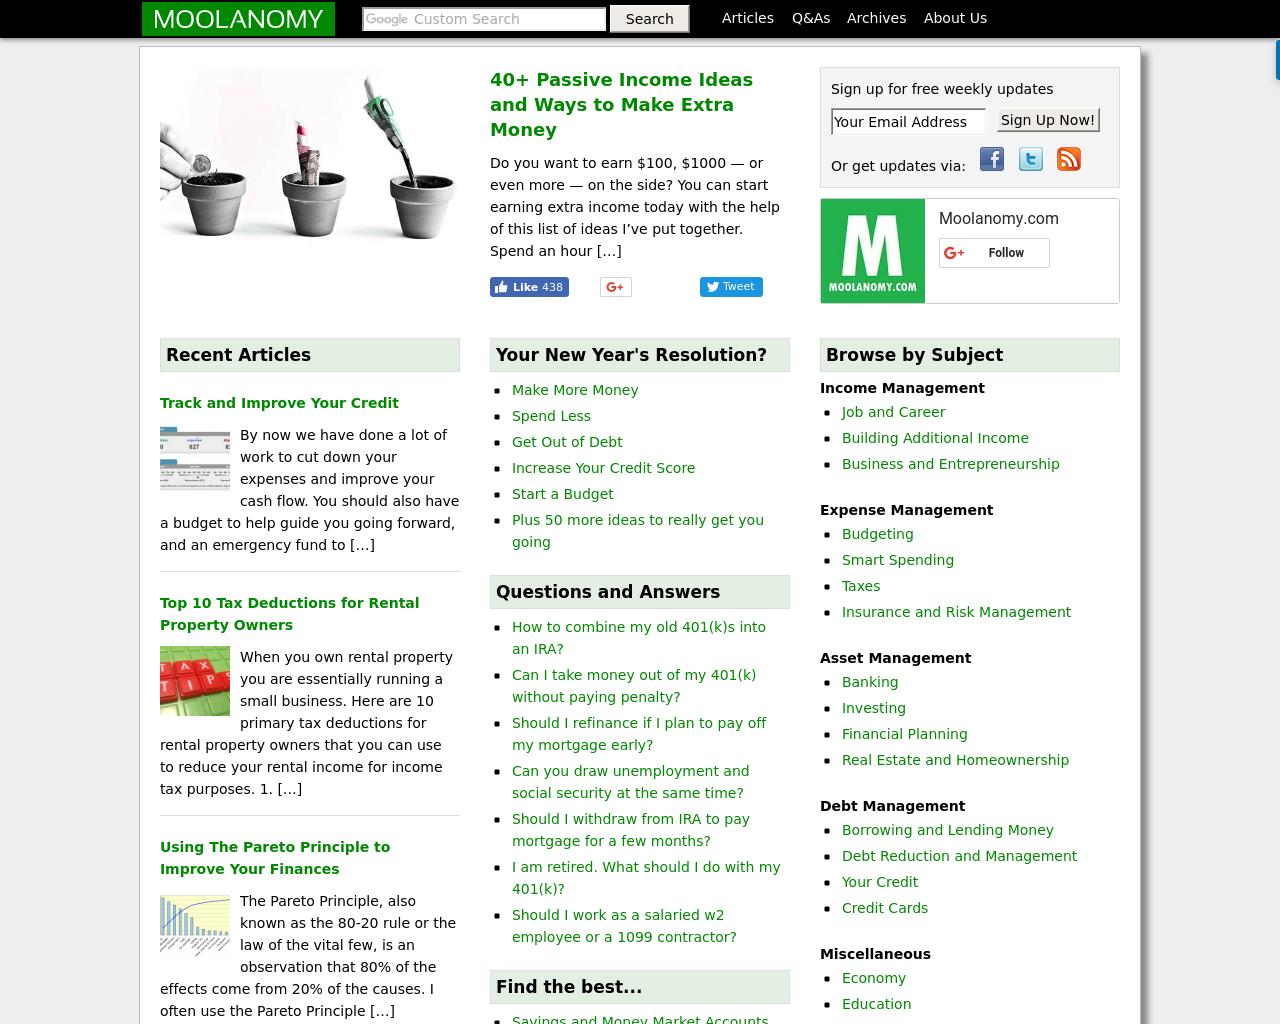 Moolanomy-Advertising-Reviews-Pricing